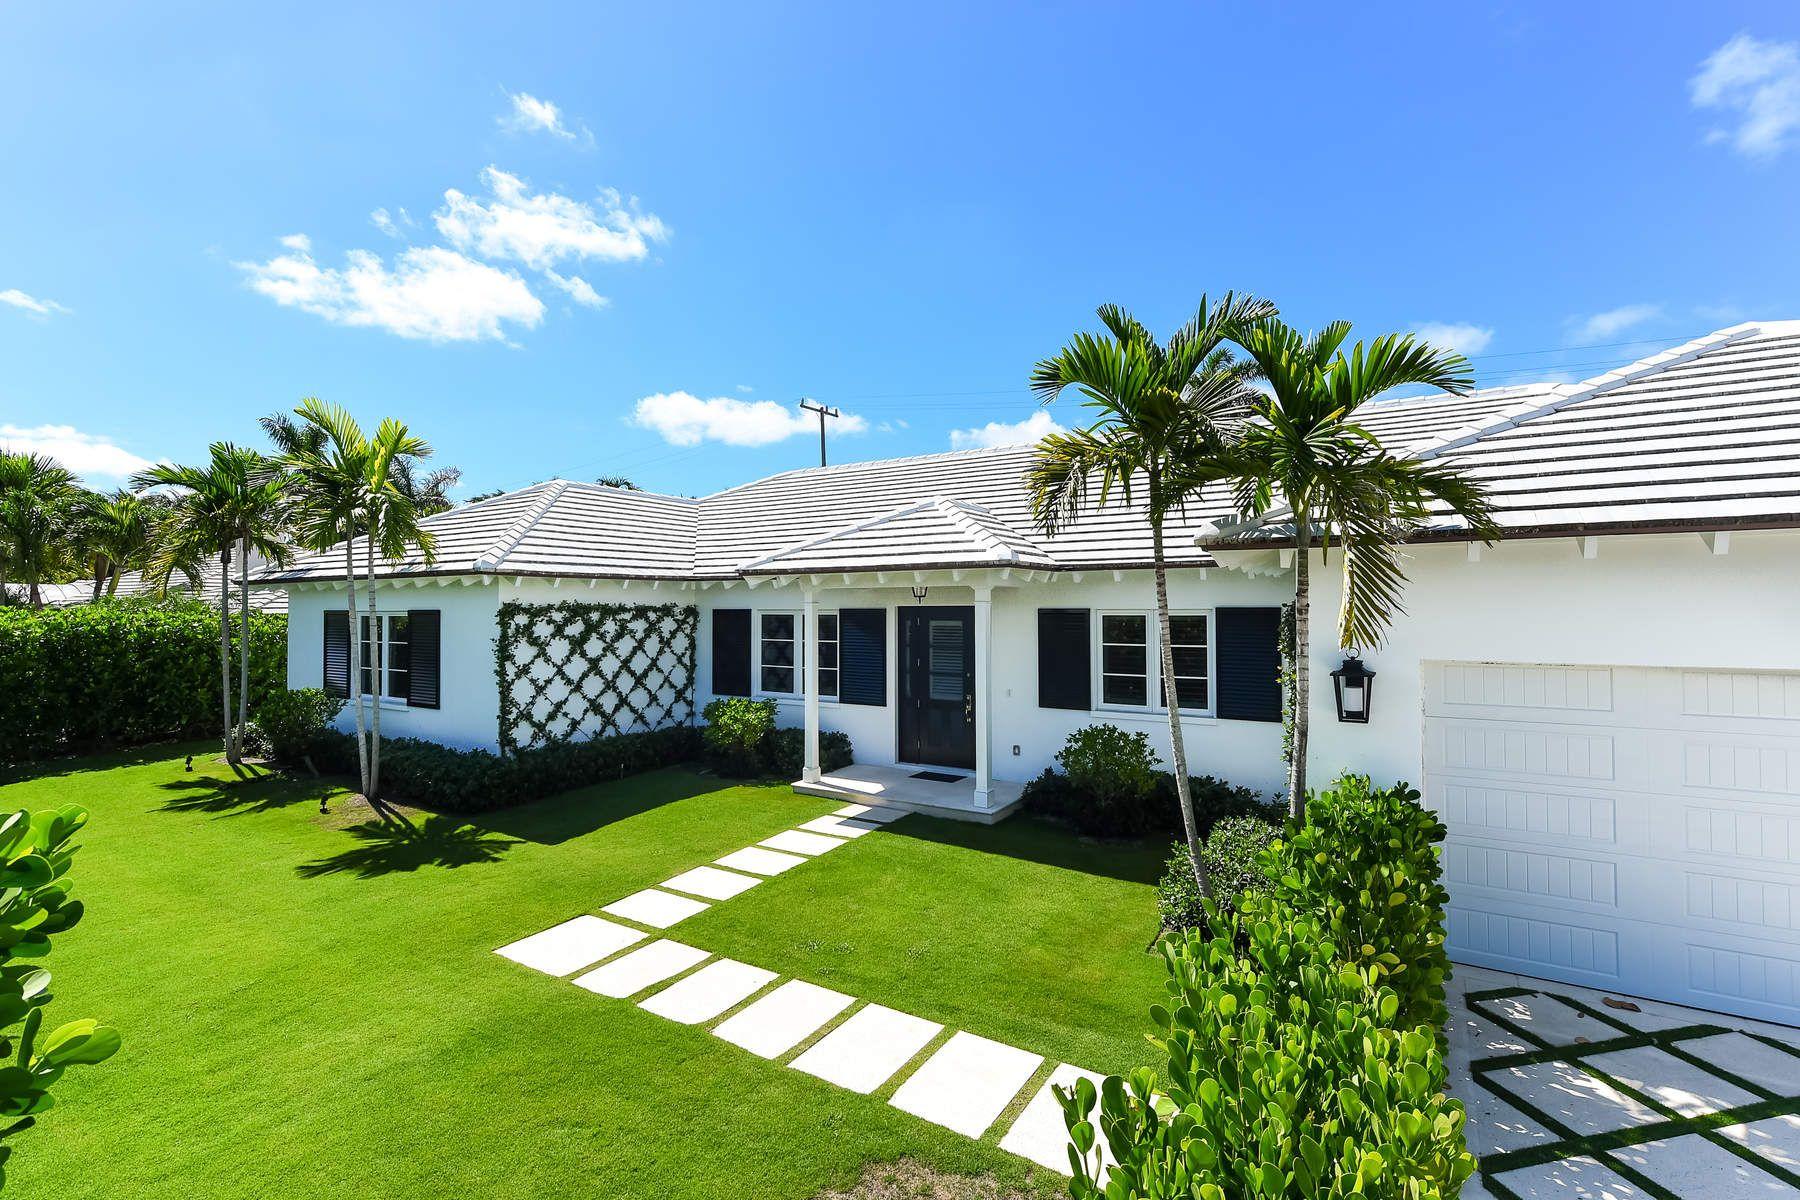 Single Family Home for Sale at 226 Via Linda 226 Via Linda Palm Beach, Florida 33480 United States